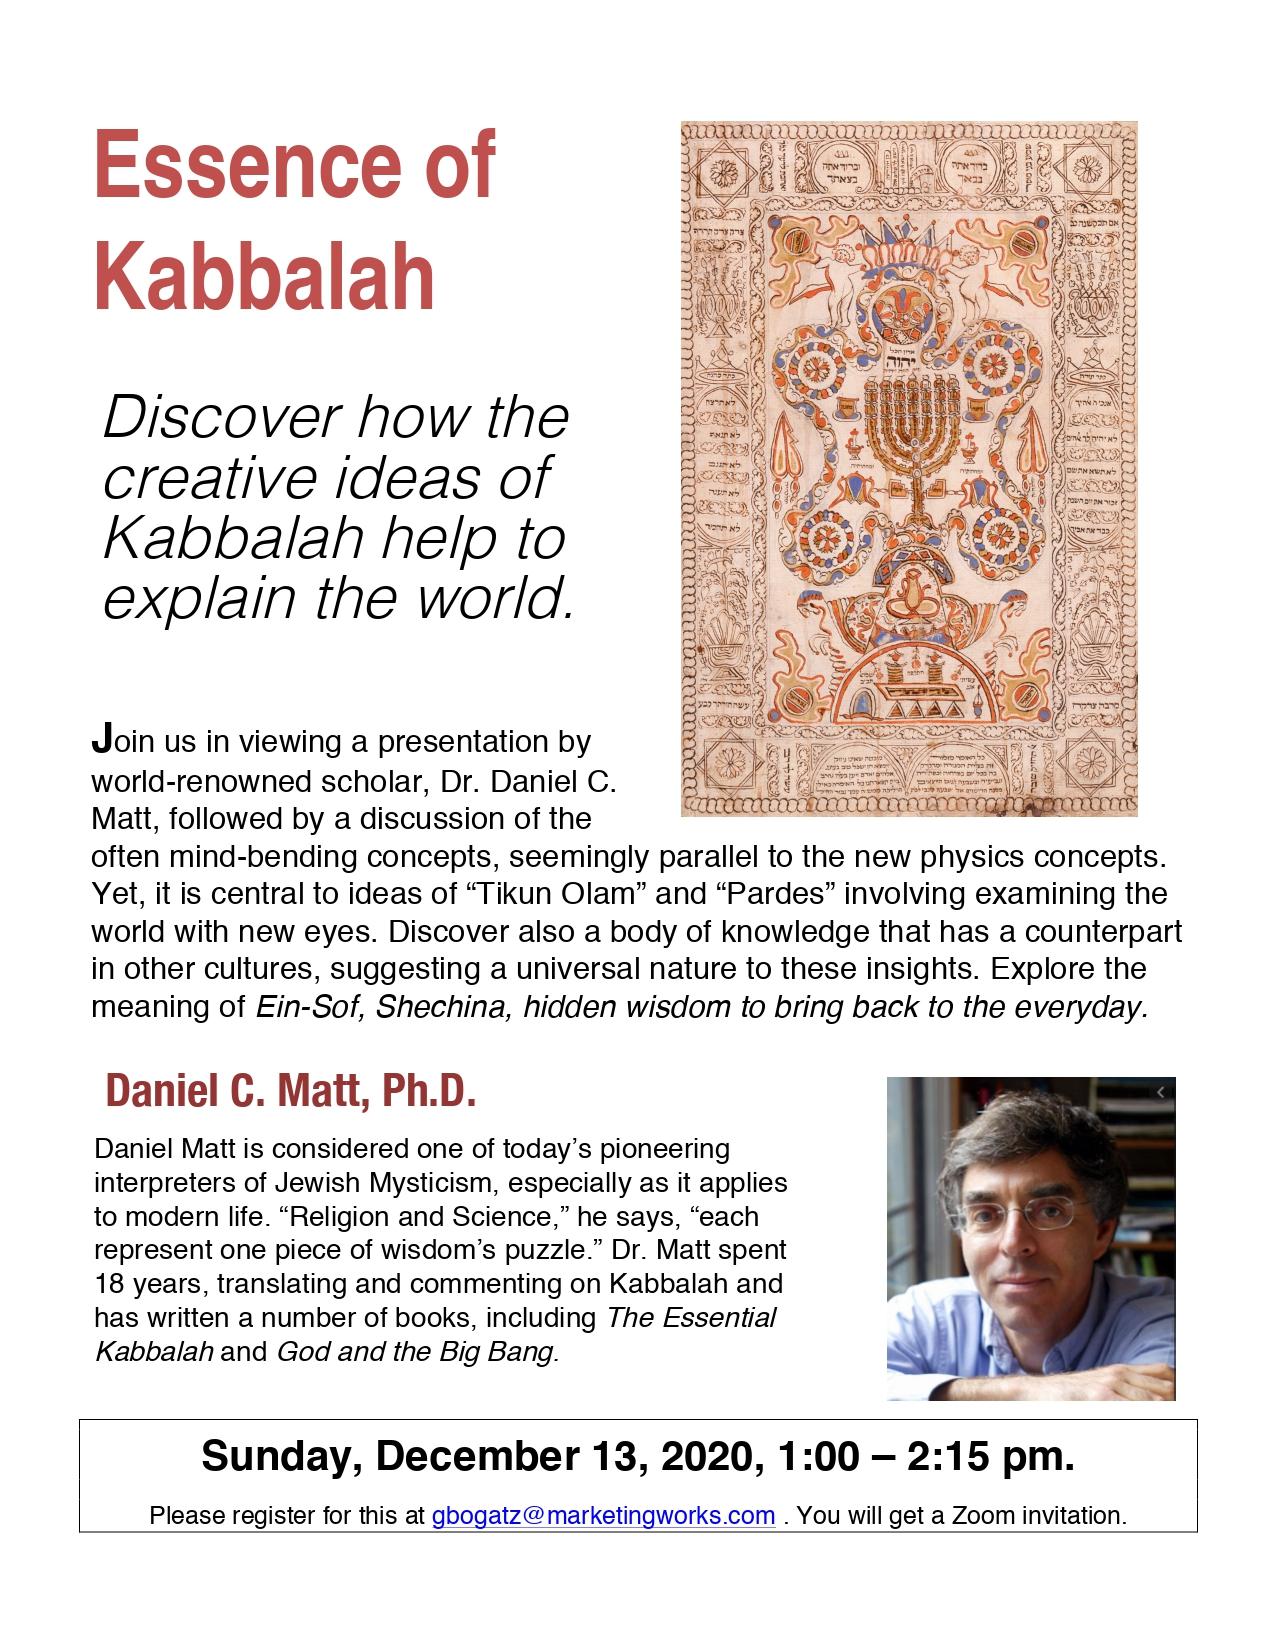 Banner Image for Essence of Kabbalah